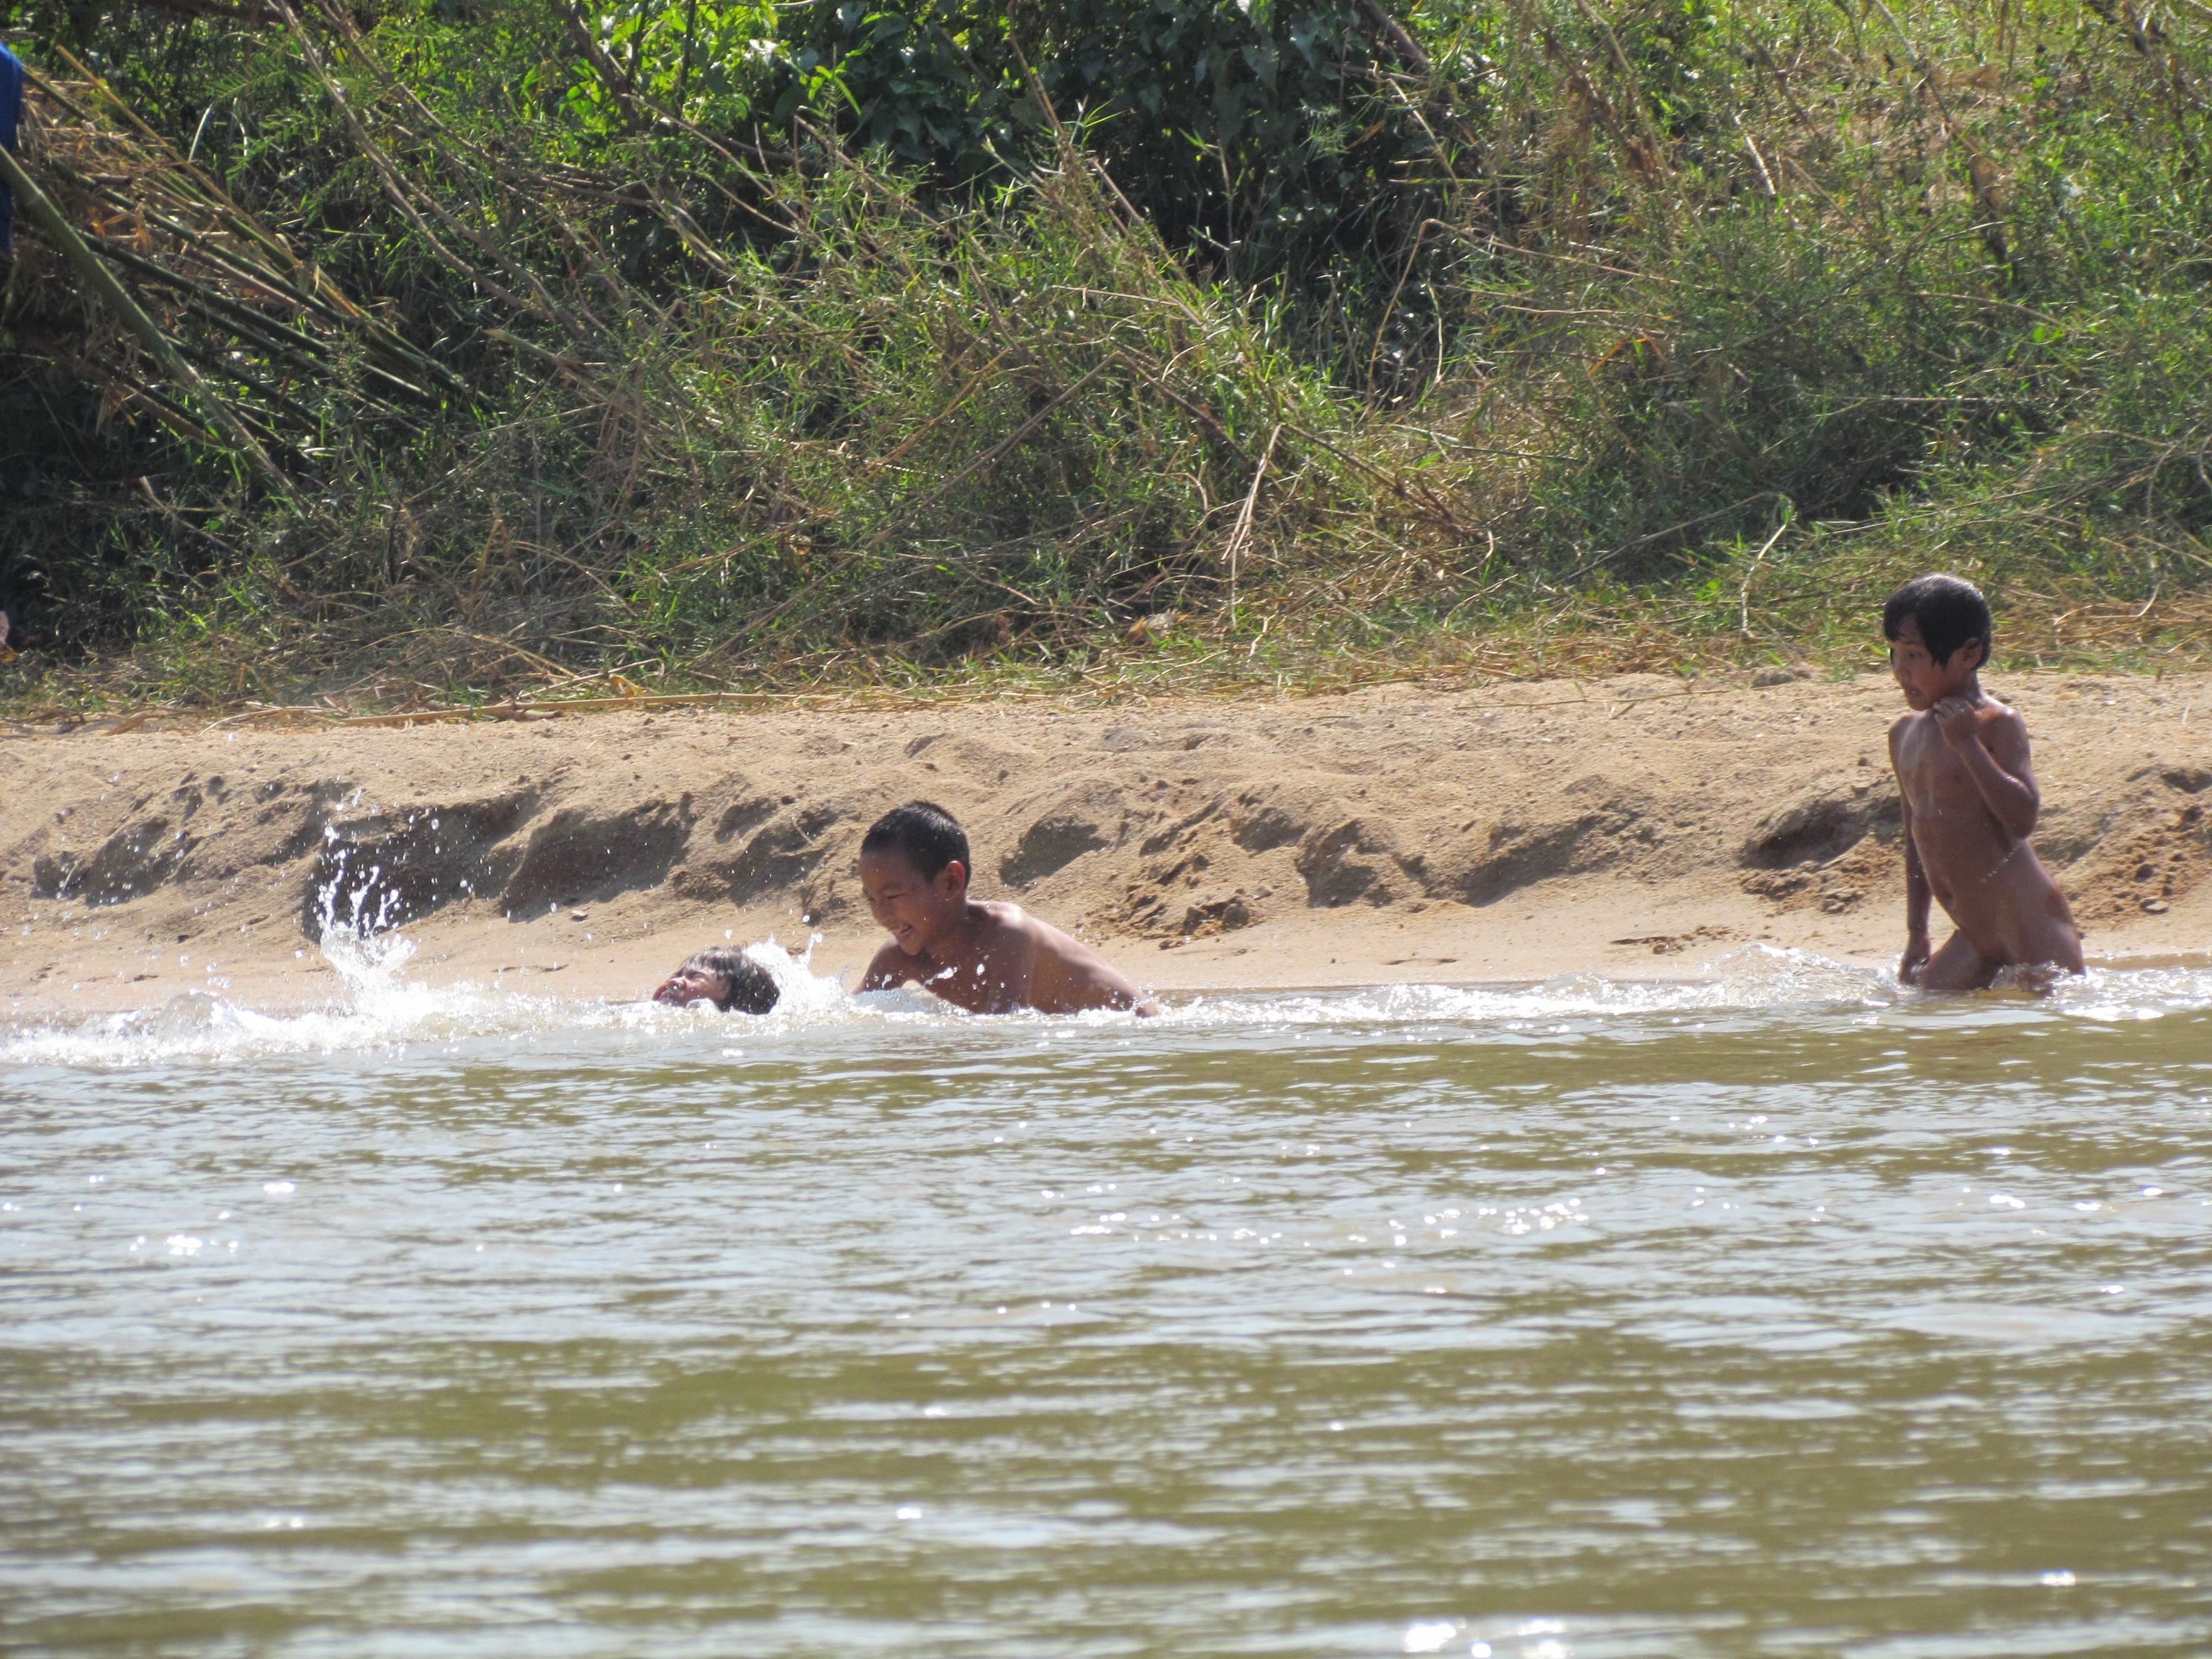 boy swimming river - photo #35